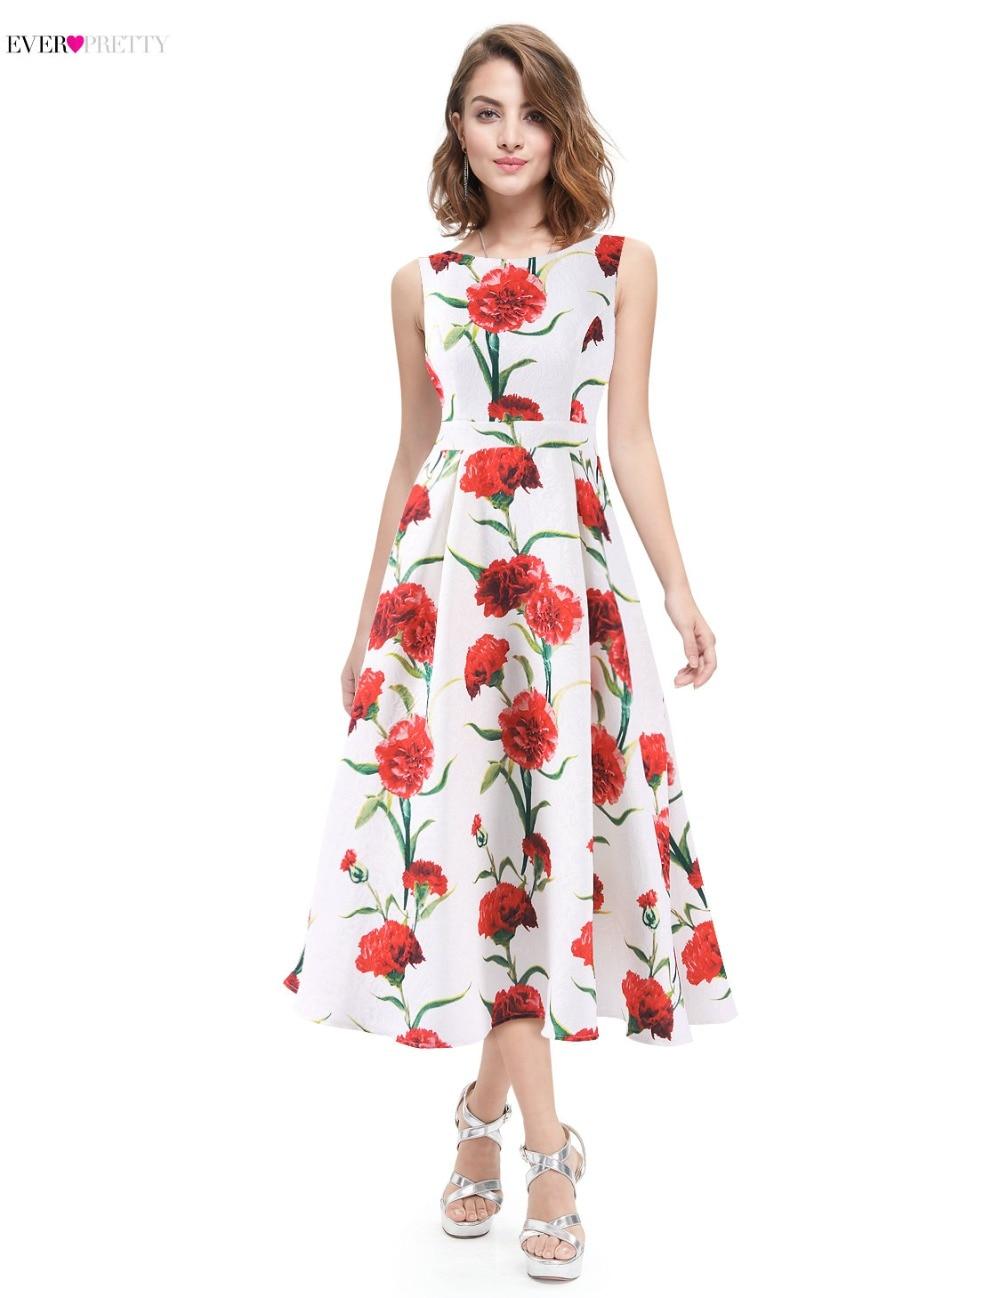 Ever Pretty Floral Print Prom Dresses Tea Length White And Blue